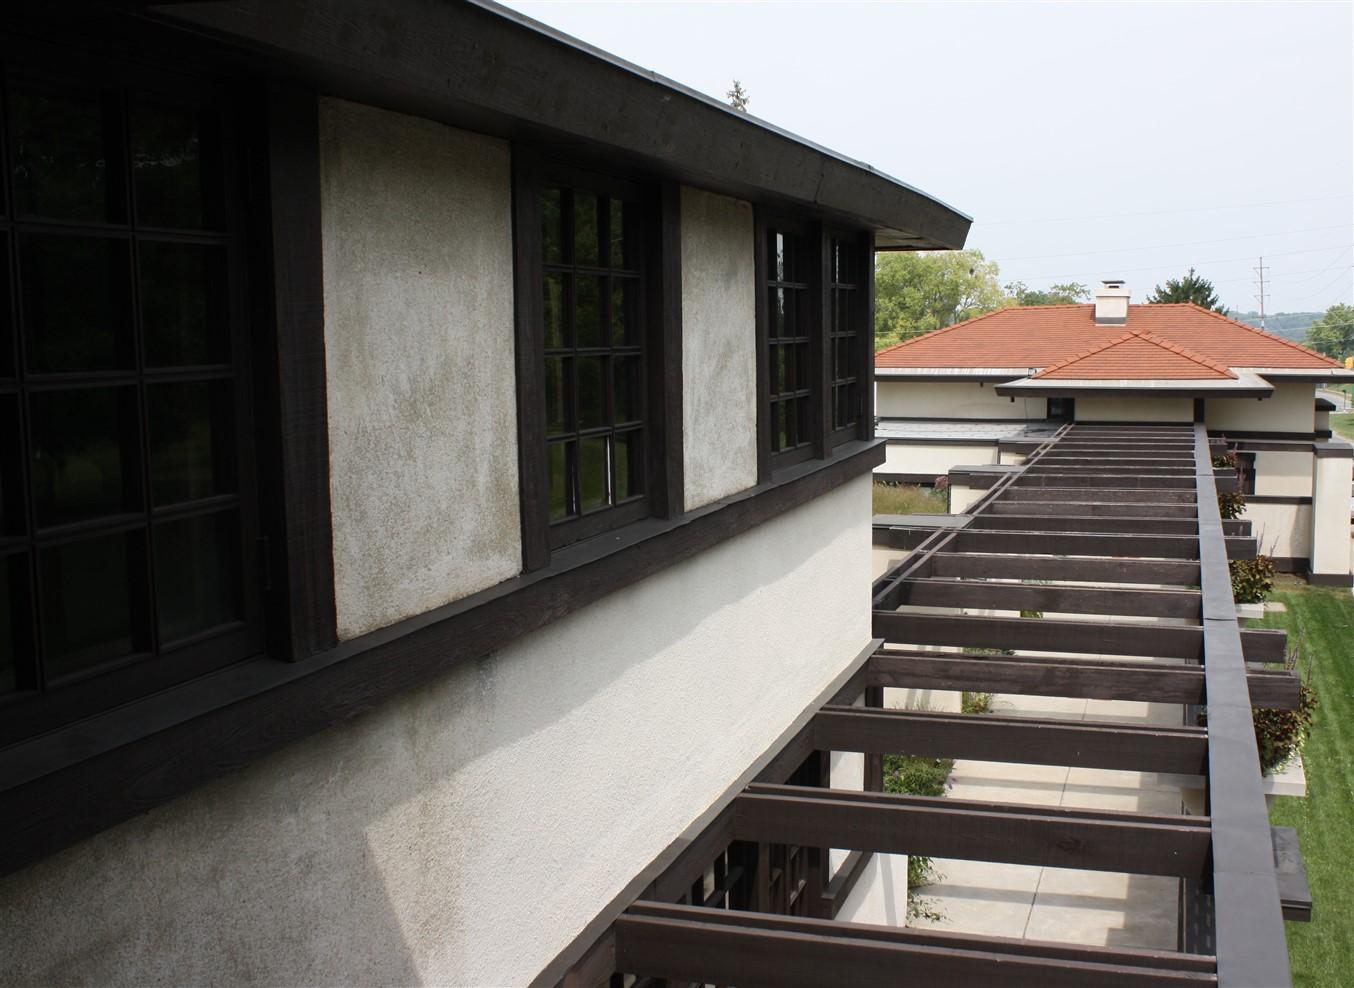 2011 08 20 Westcott House Springfield OH 13.jpg